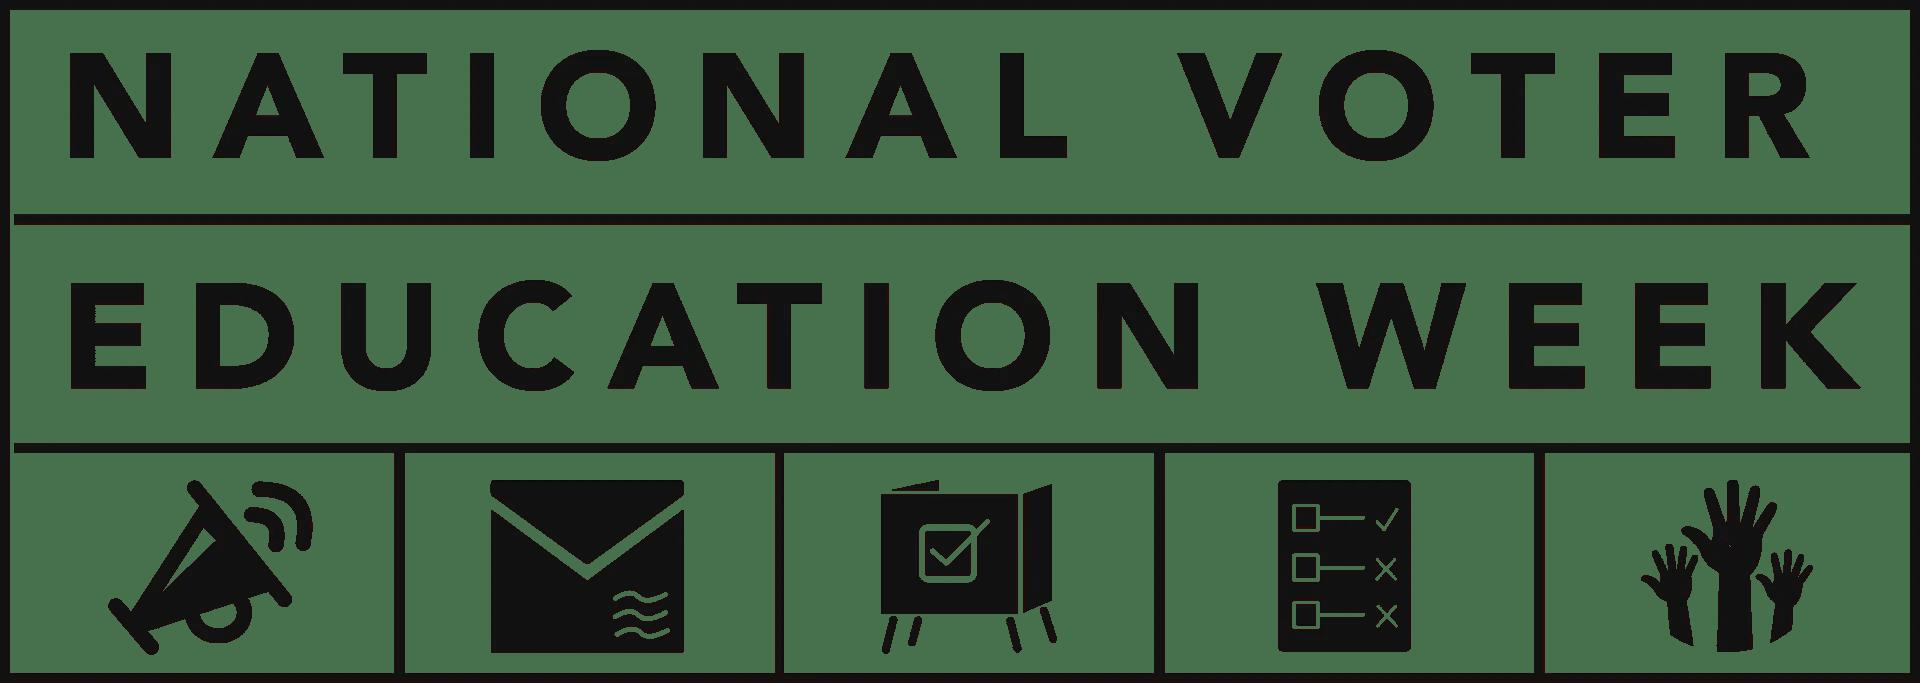 National Voter Education Week Logo